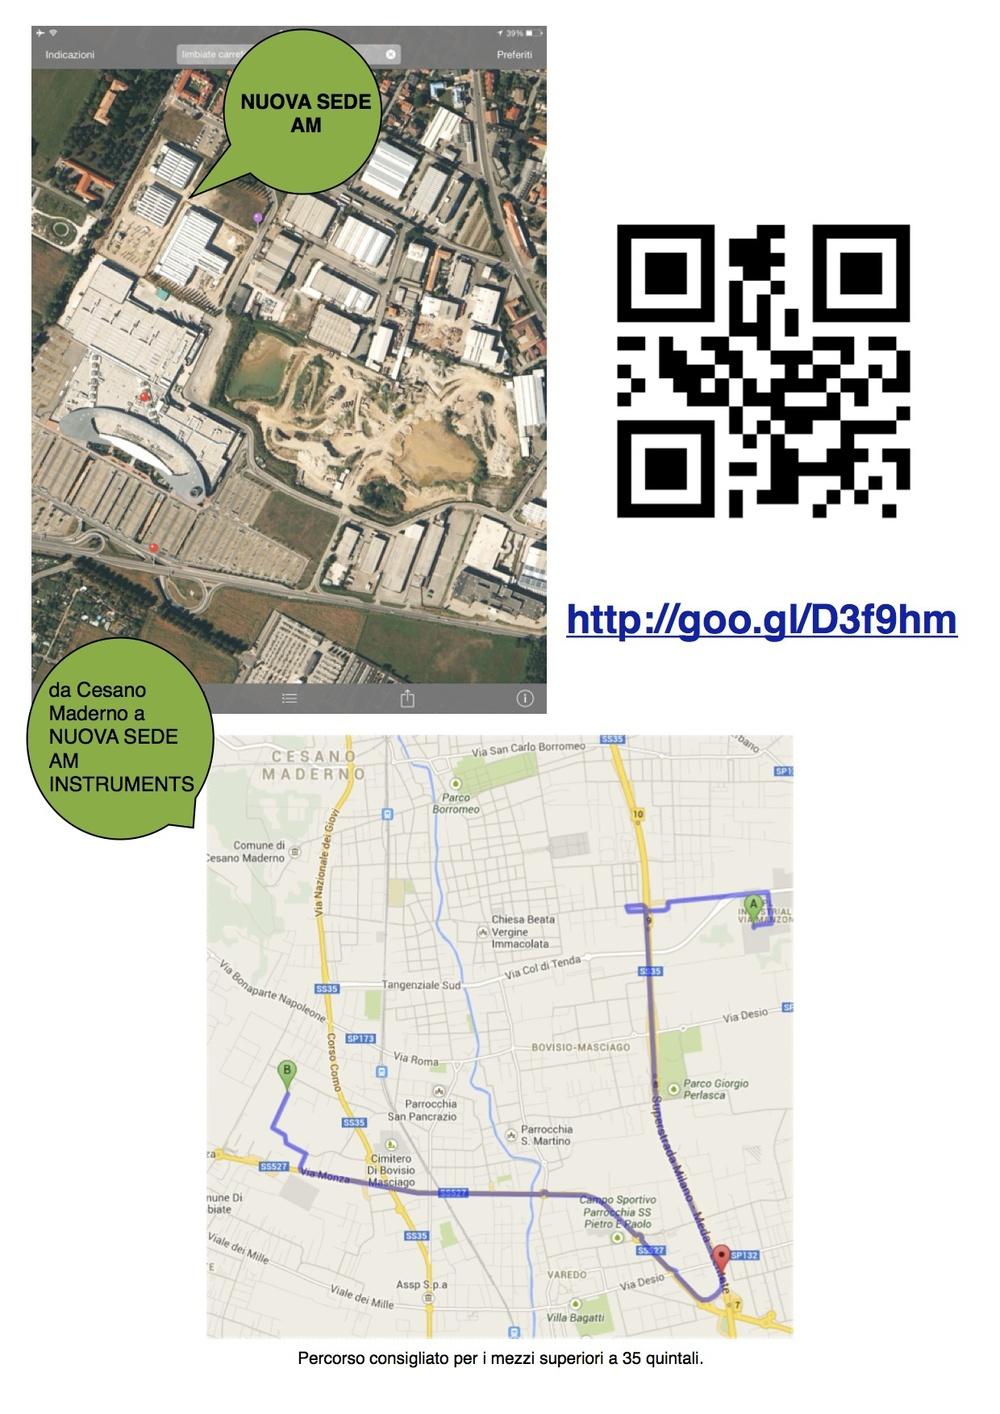 Volantino_corrieri-03122013.jpg